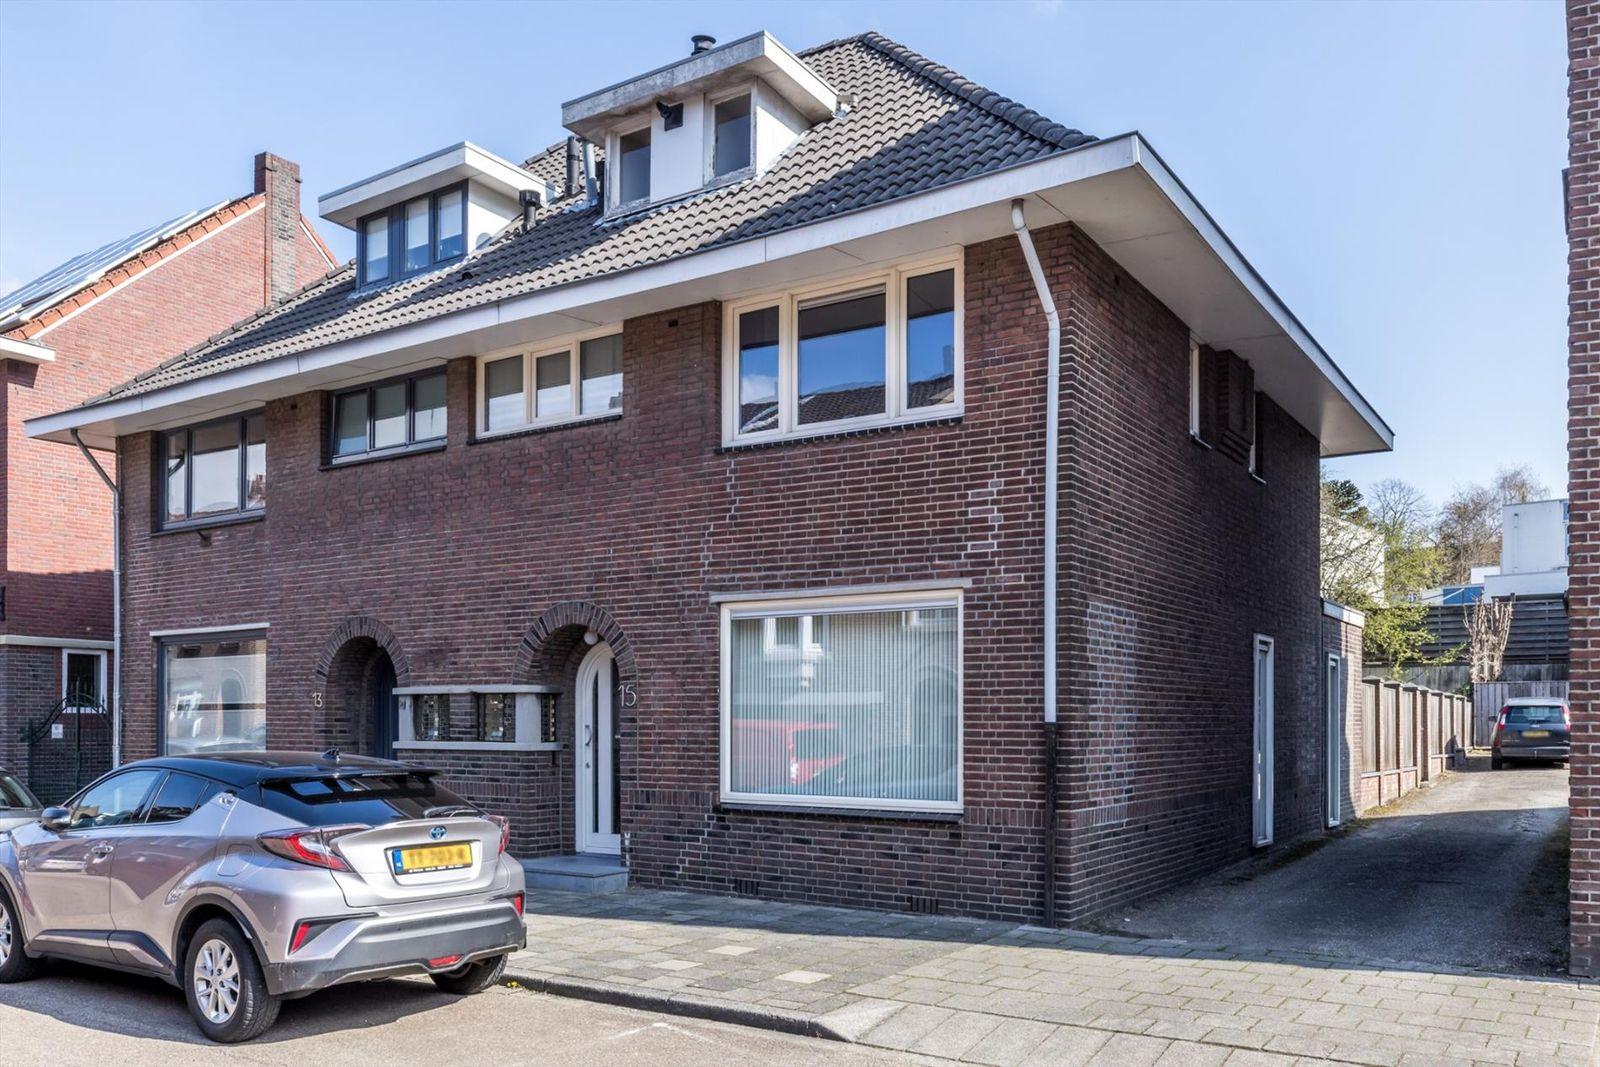 Buttingstraat 15, Hoensbroek